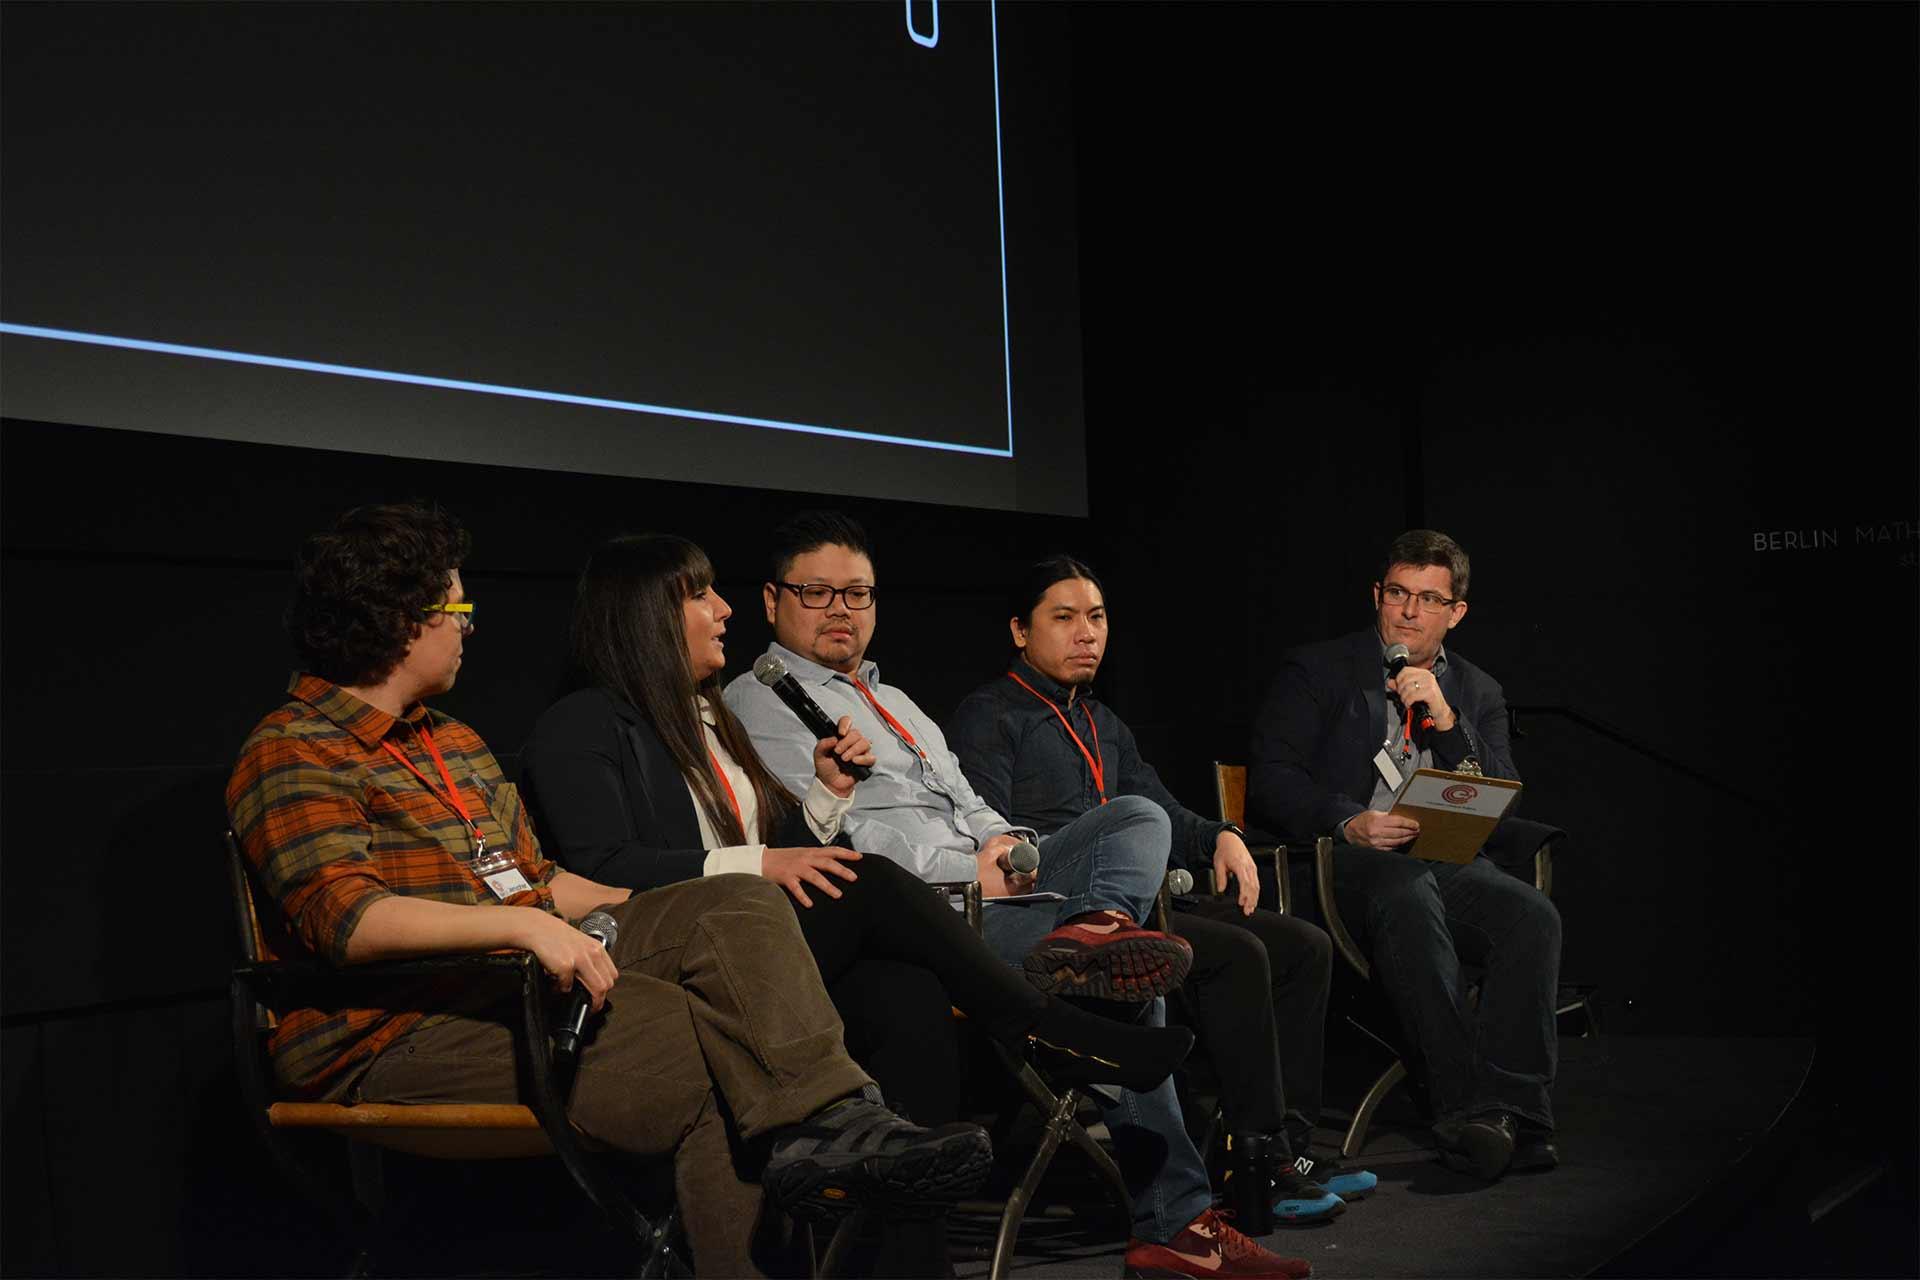 2020 EditCon Panelist 1 group